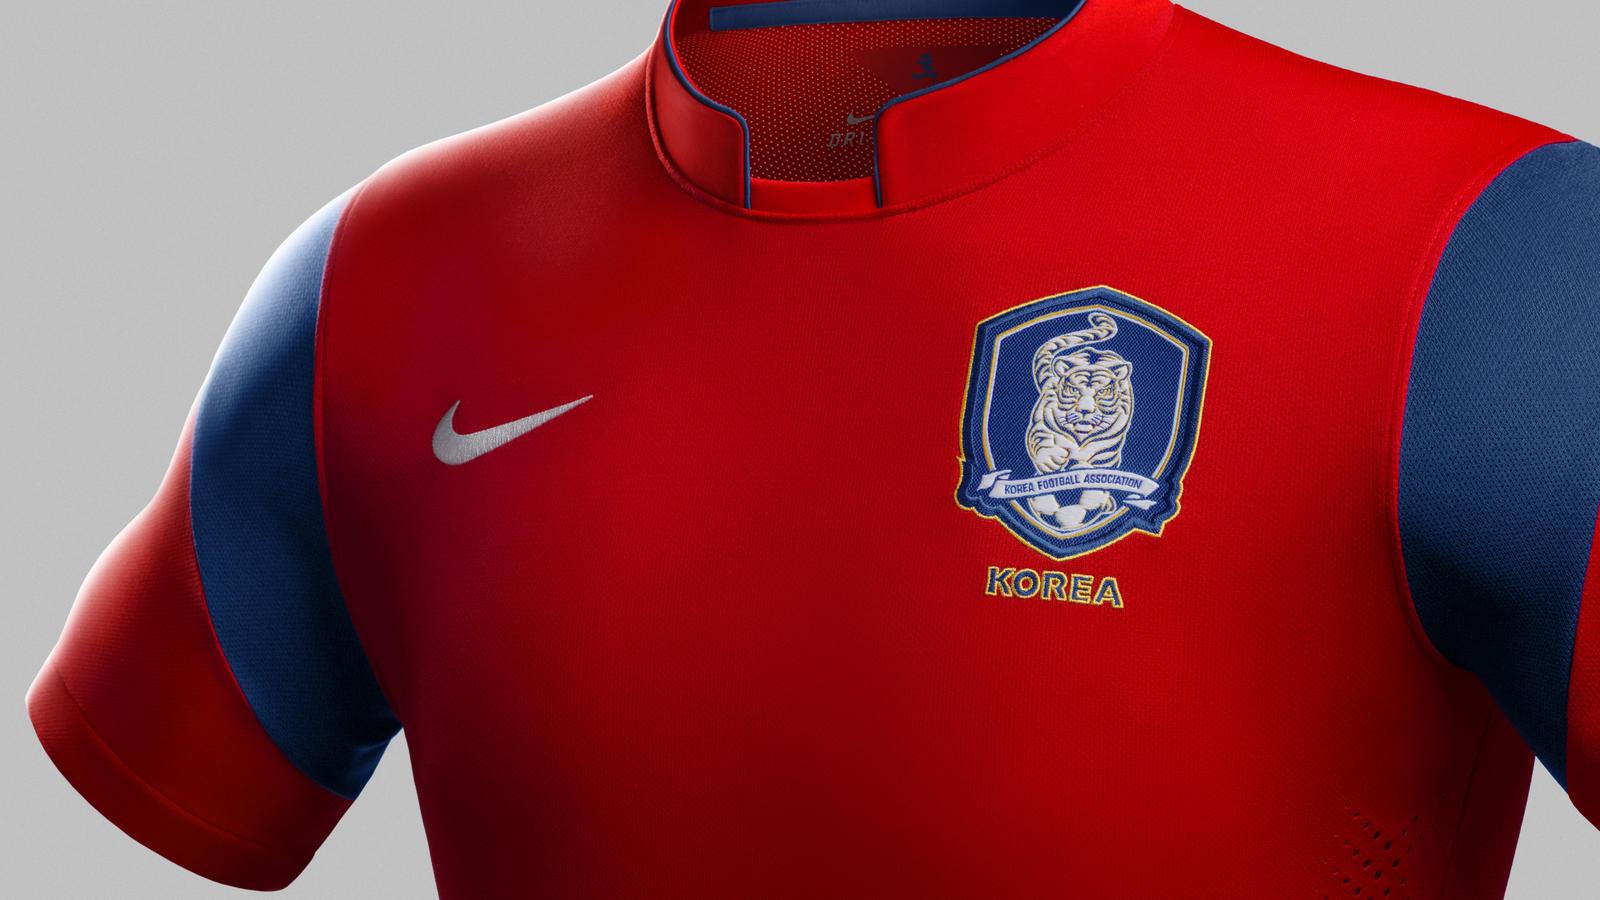 d2ad1b399d3 Nike Football Unveils 2014 Korea National Team Kit - Nike News